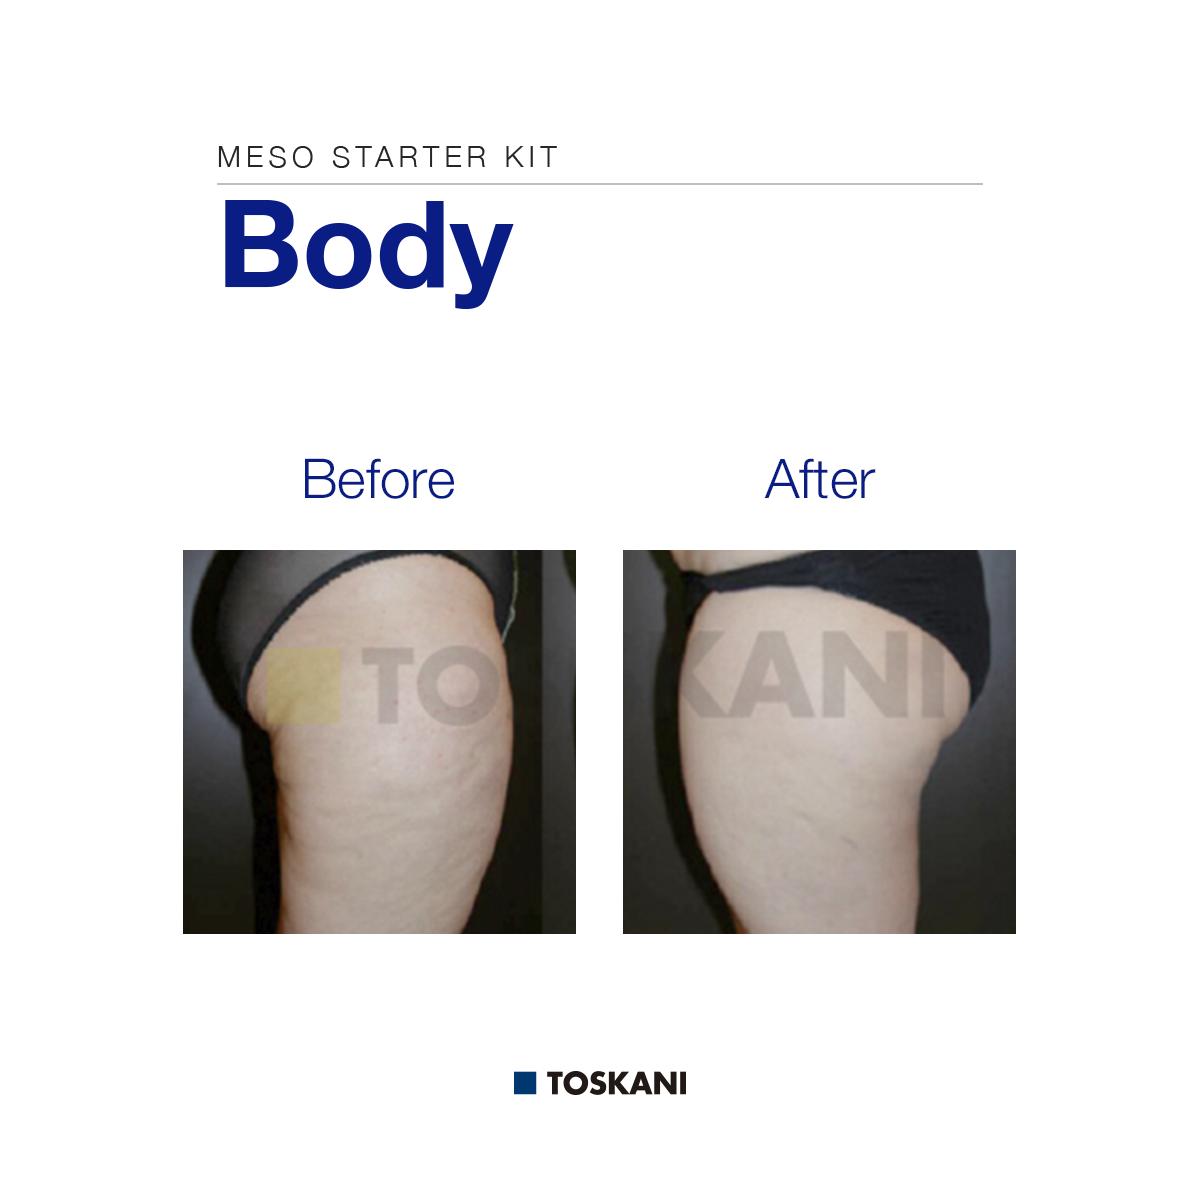 TKN_Body-Meso_Starter